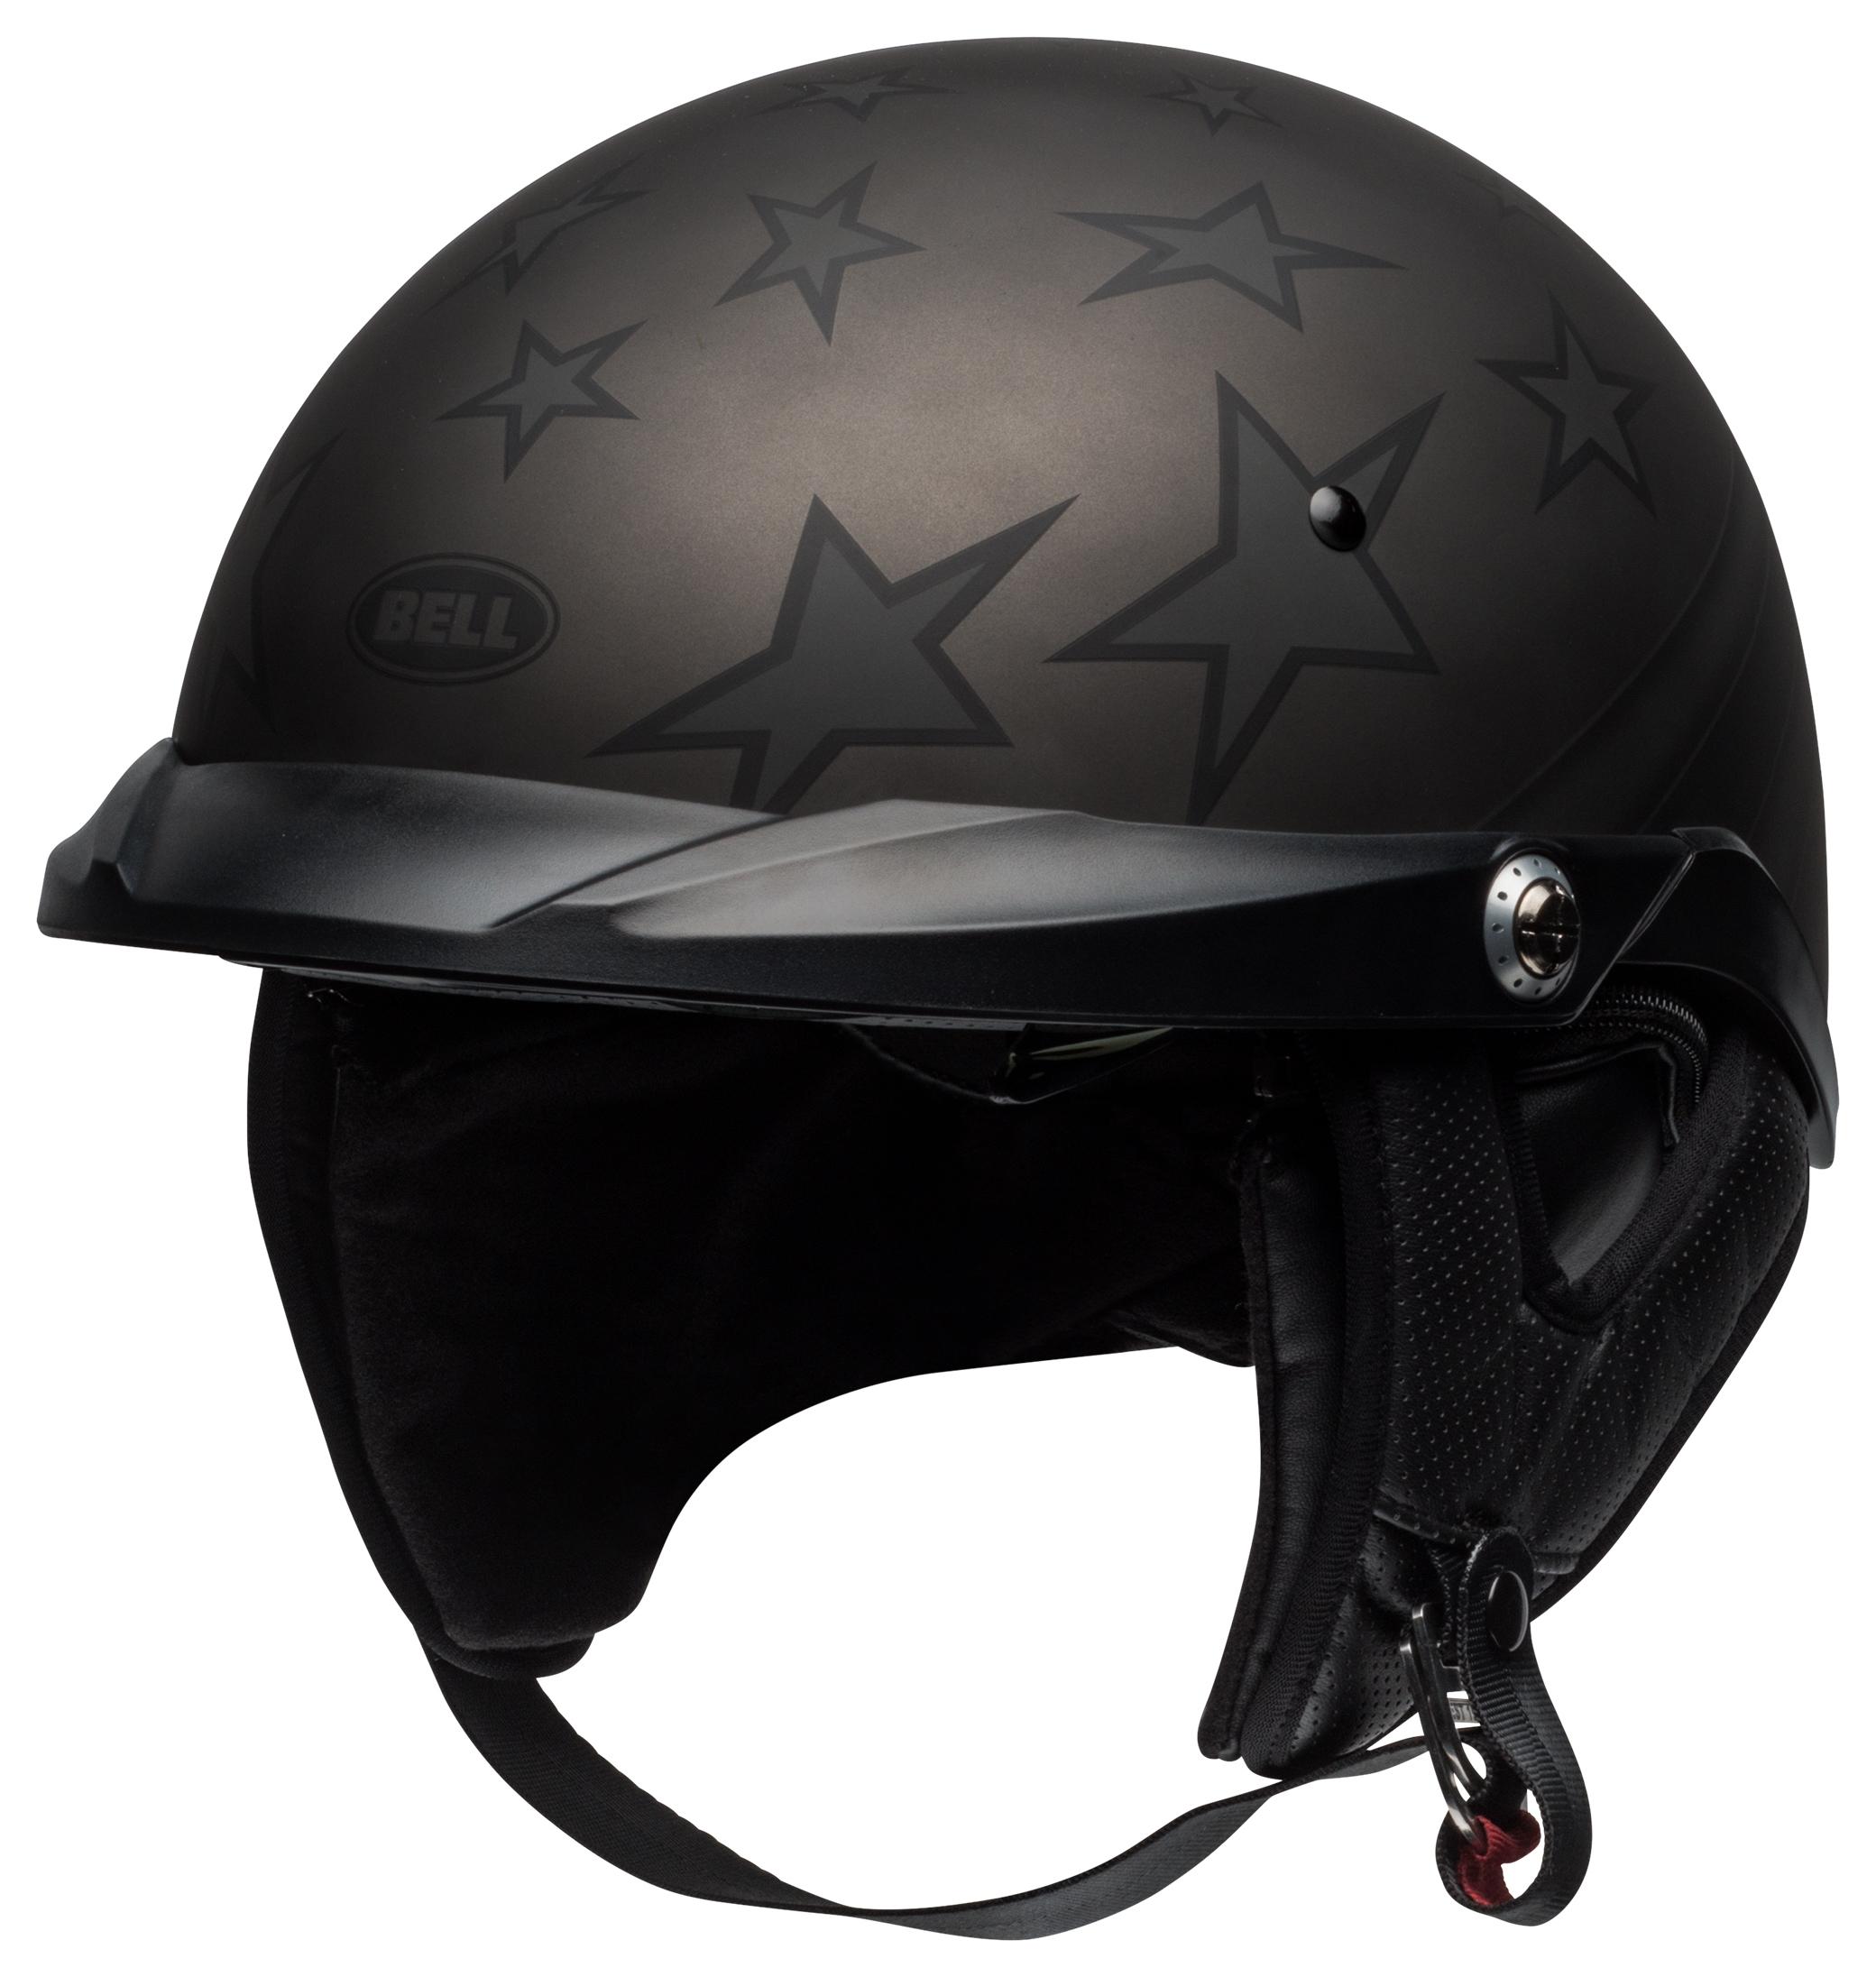 Bell Pit Boss Honor Helmet | 15% ($19 49) Off!